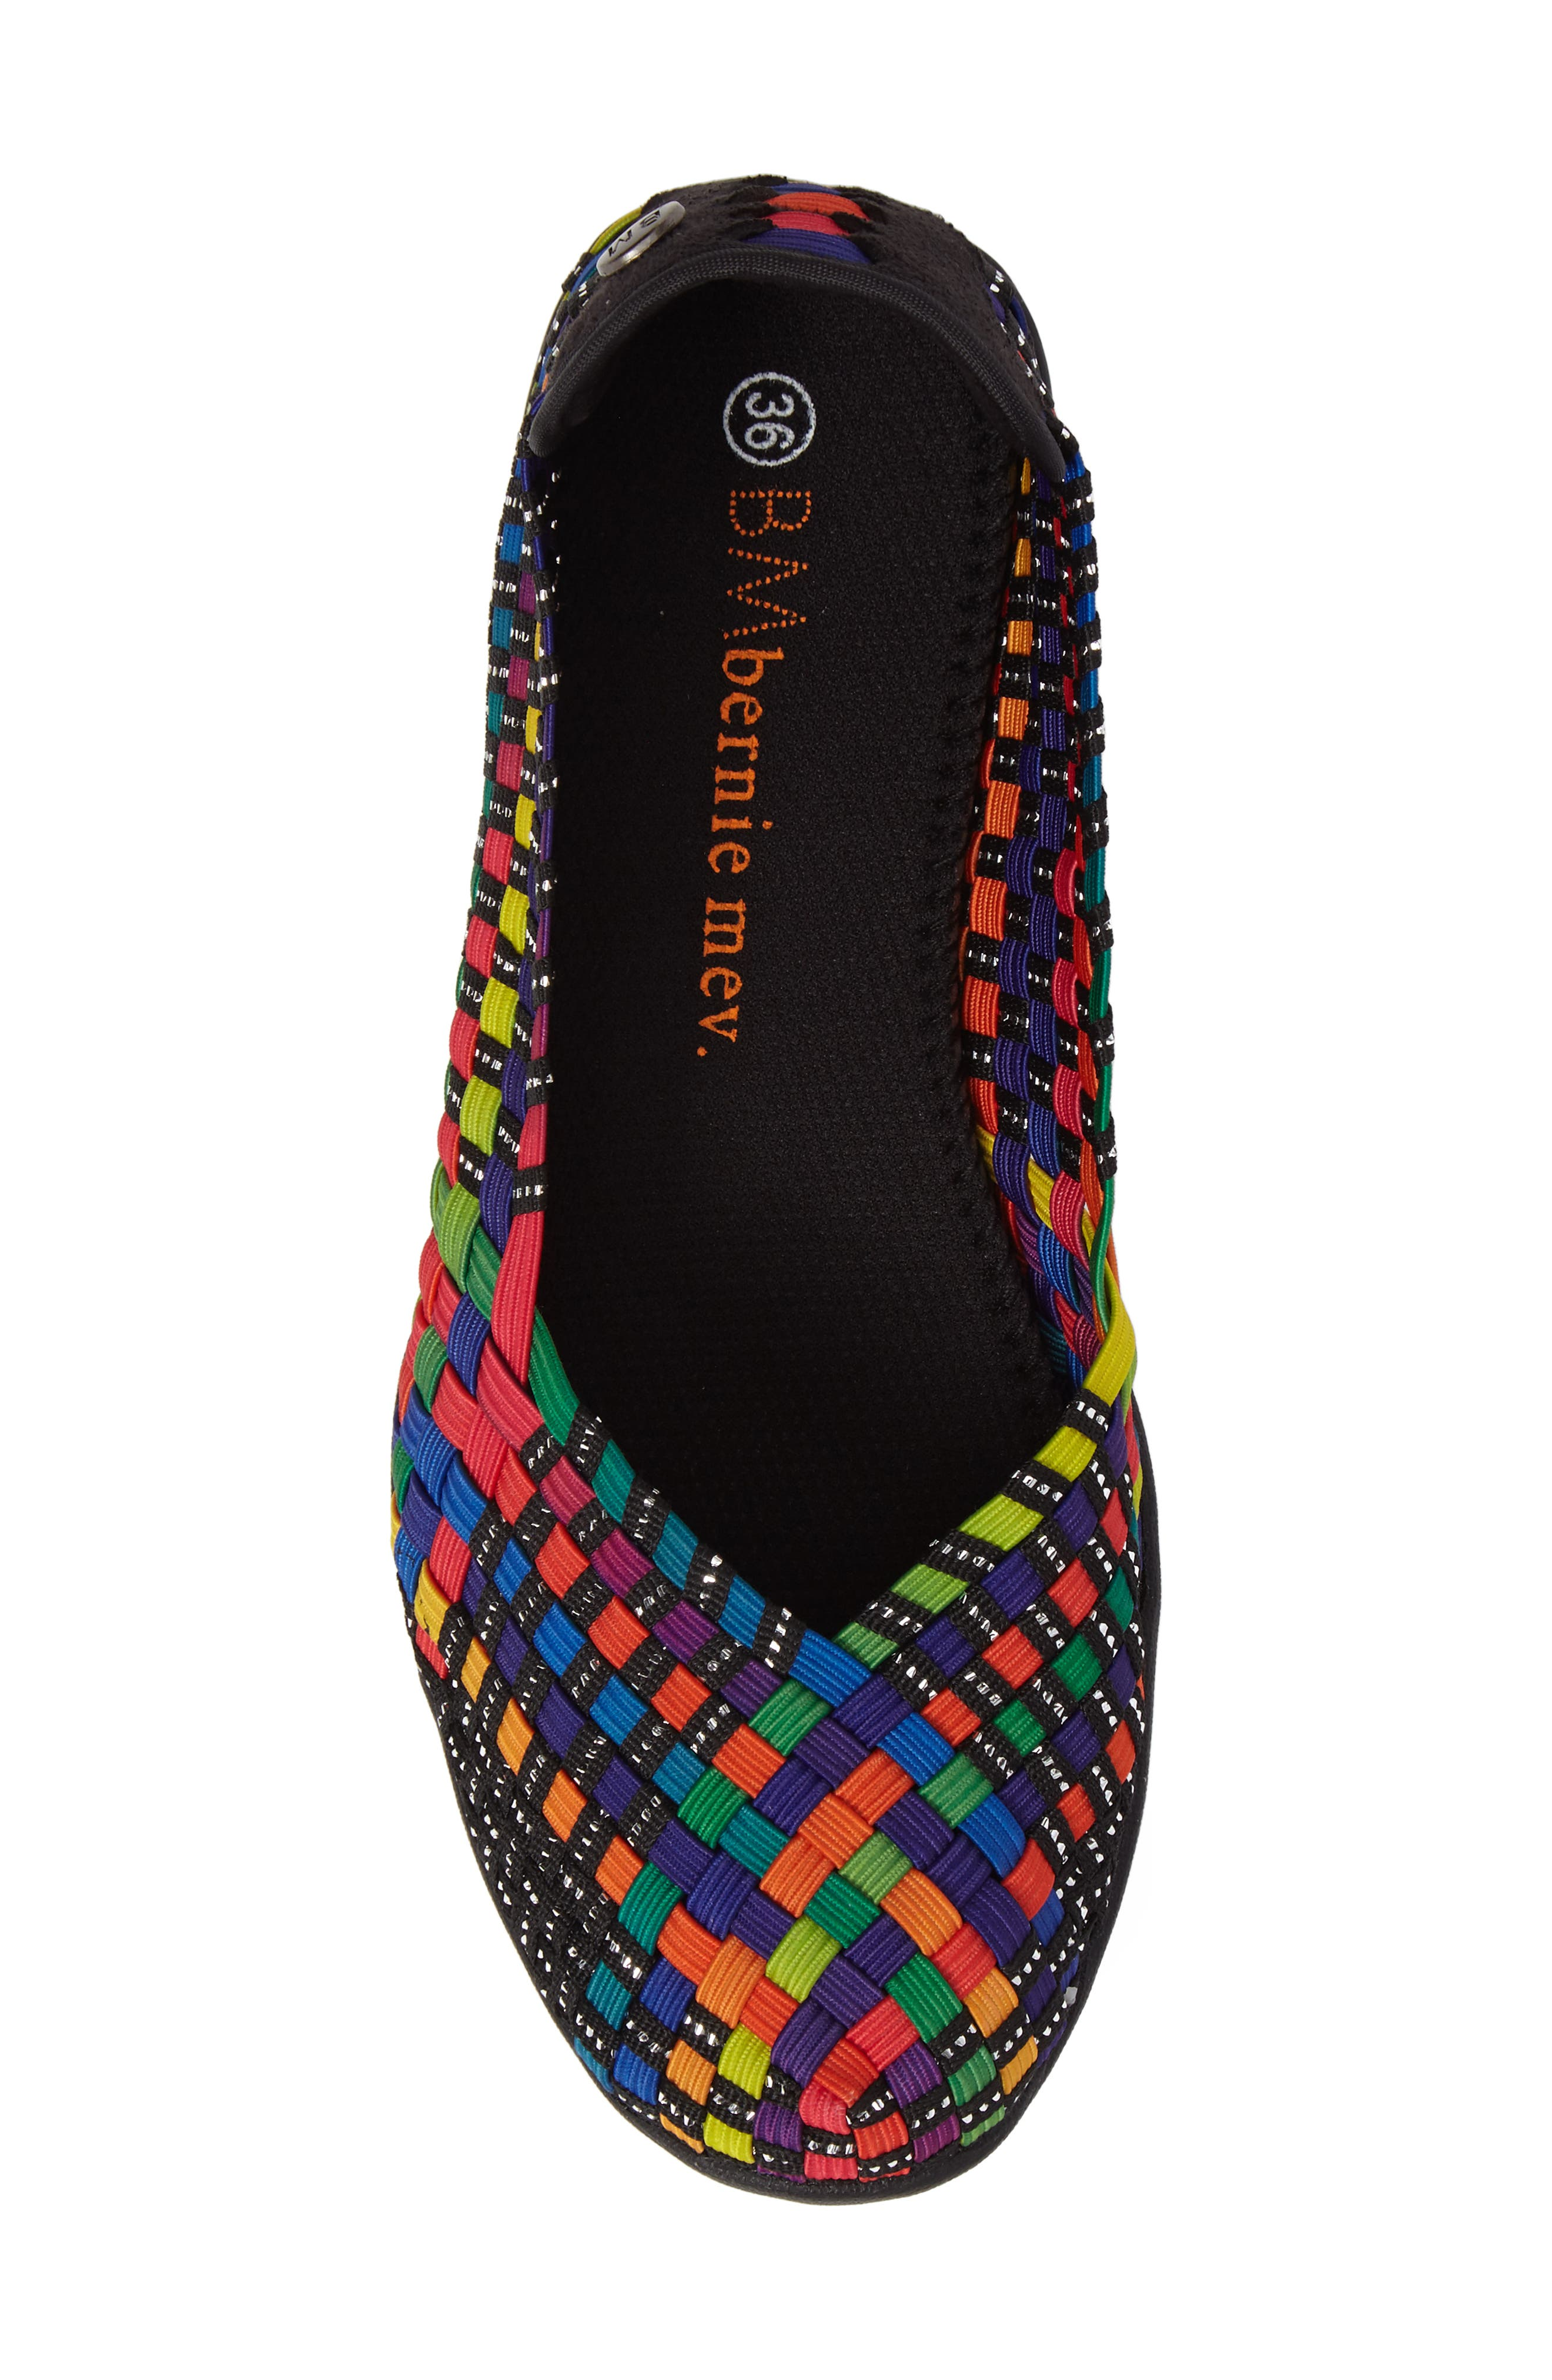 Catwalk Sneaker,                             Alternate thumbnail 5, color,                             Black Multi